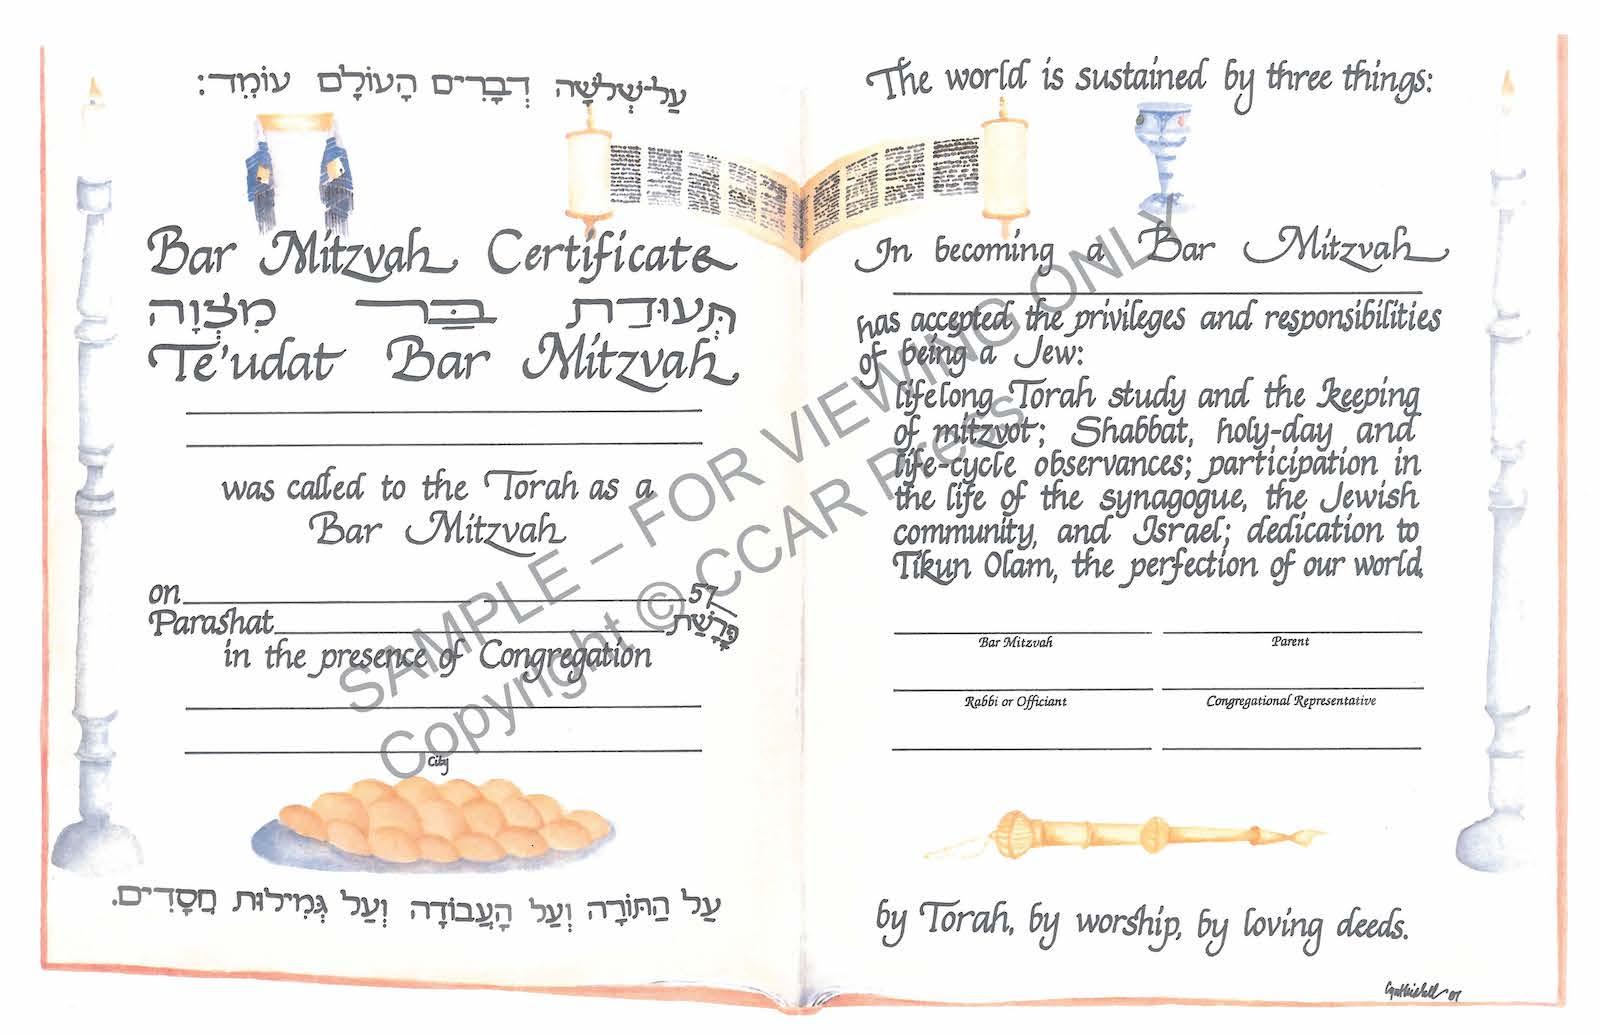 Bar Mitzvah, Illuminated - Certificate